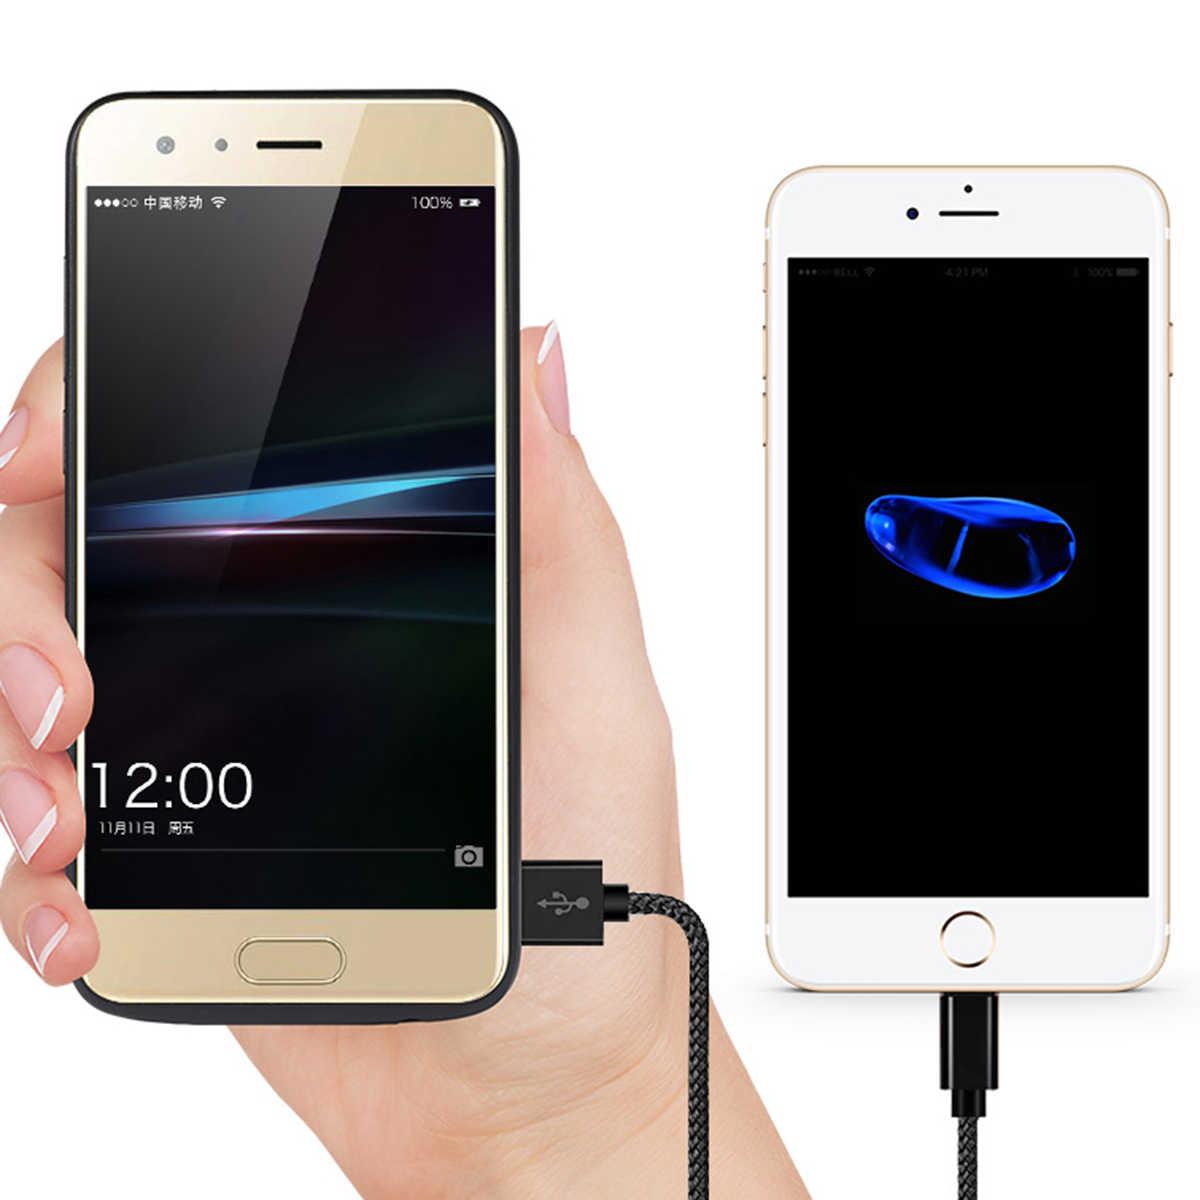 Зарядное устройство чехол для huawei Honor 9 6500 мАч power Bank зарядный чехол power bank зарядное устройство чехол для huawei Honor 9 чехол для телефона